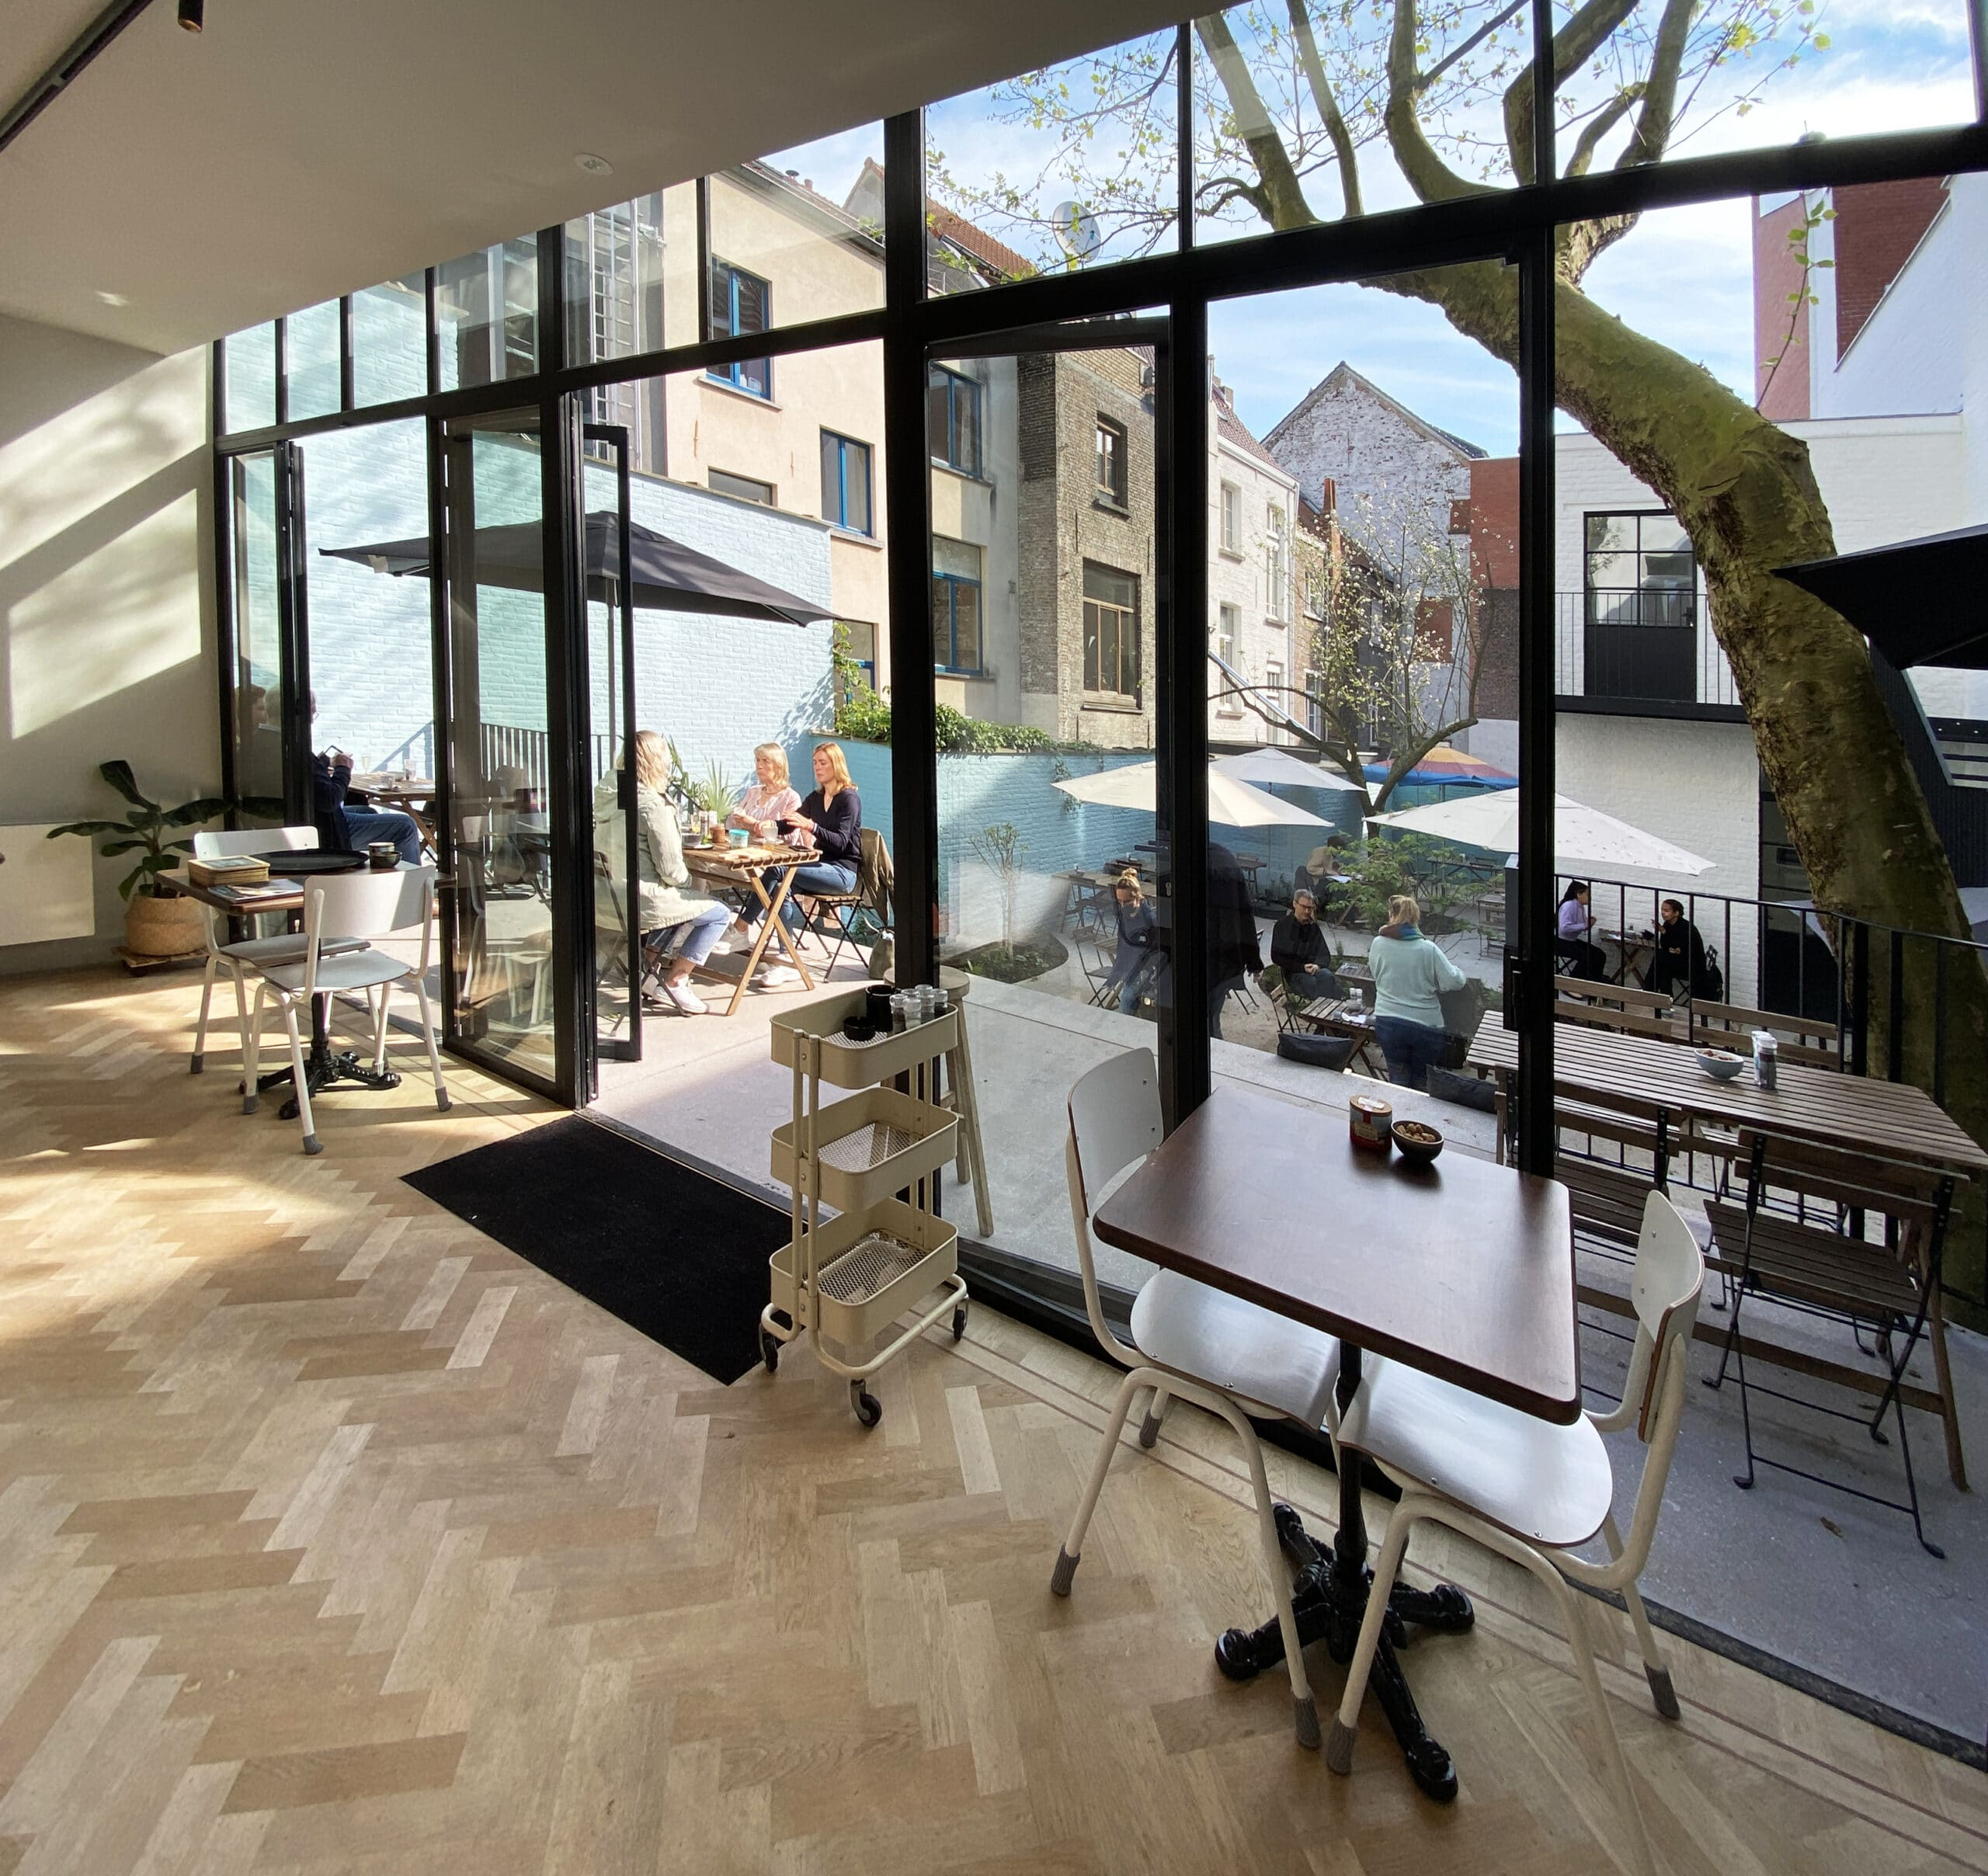 IMG 8165 2 scaled | Baeyens & Beck architecten Gent | architect nieuwbouw renovatie interieur | high end | architectenbureau